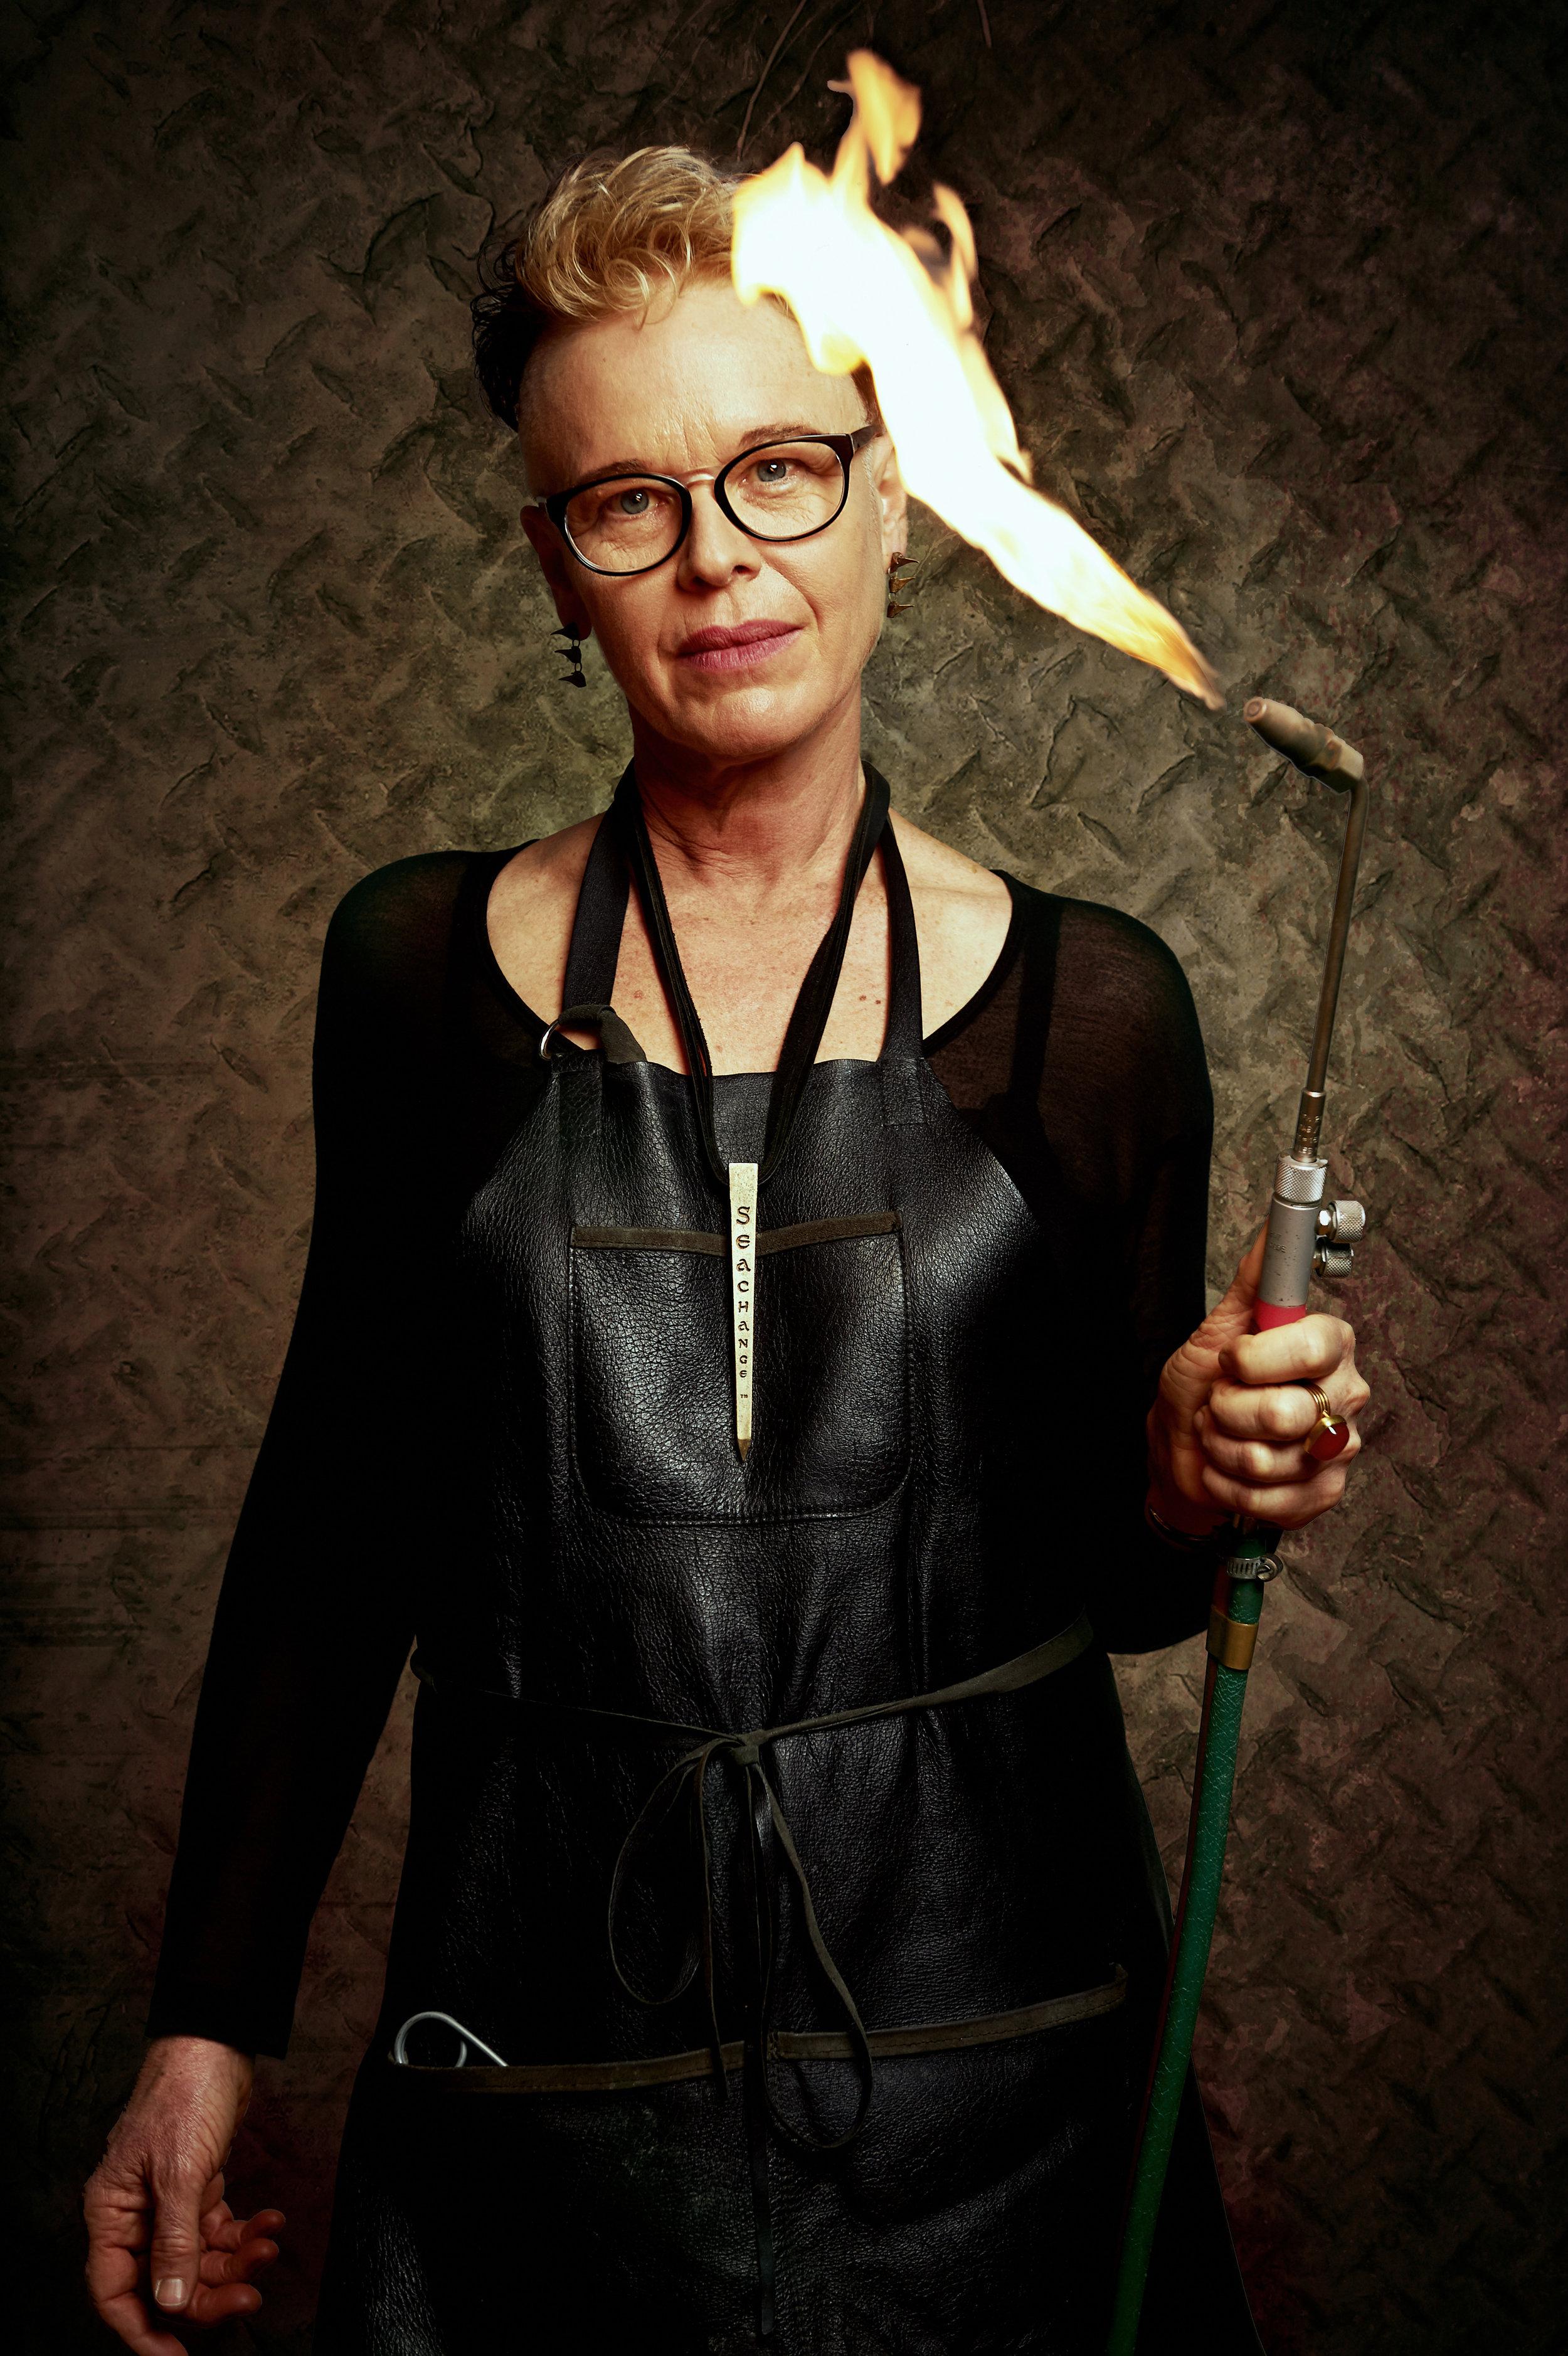 marta-hewson-donna-hiebert-jewellery-maker-editorial-portrait-26221.jpg